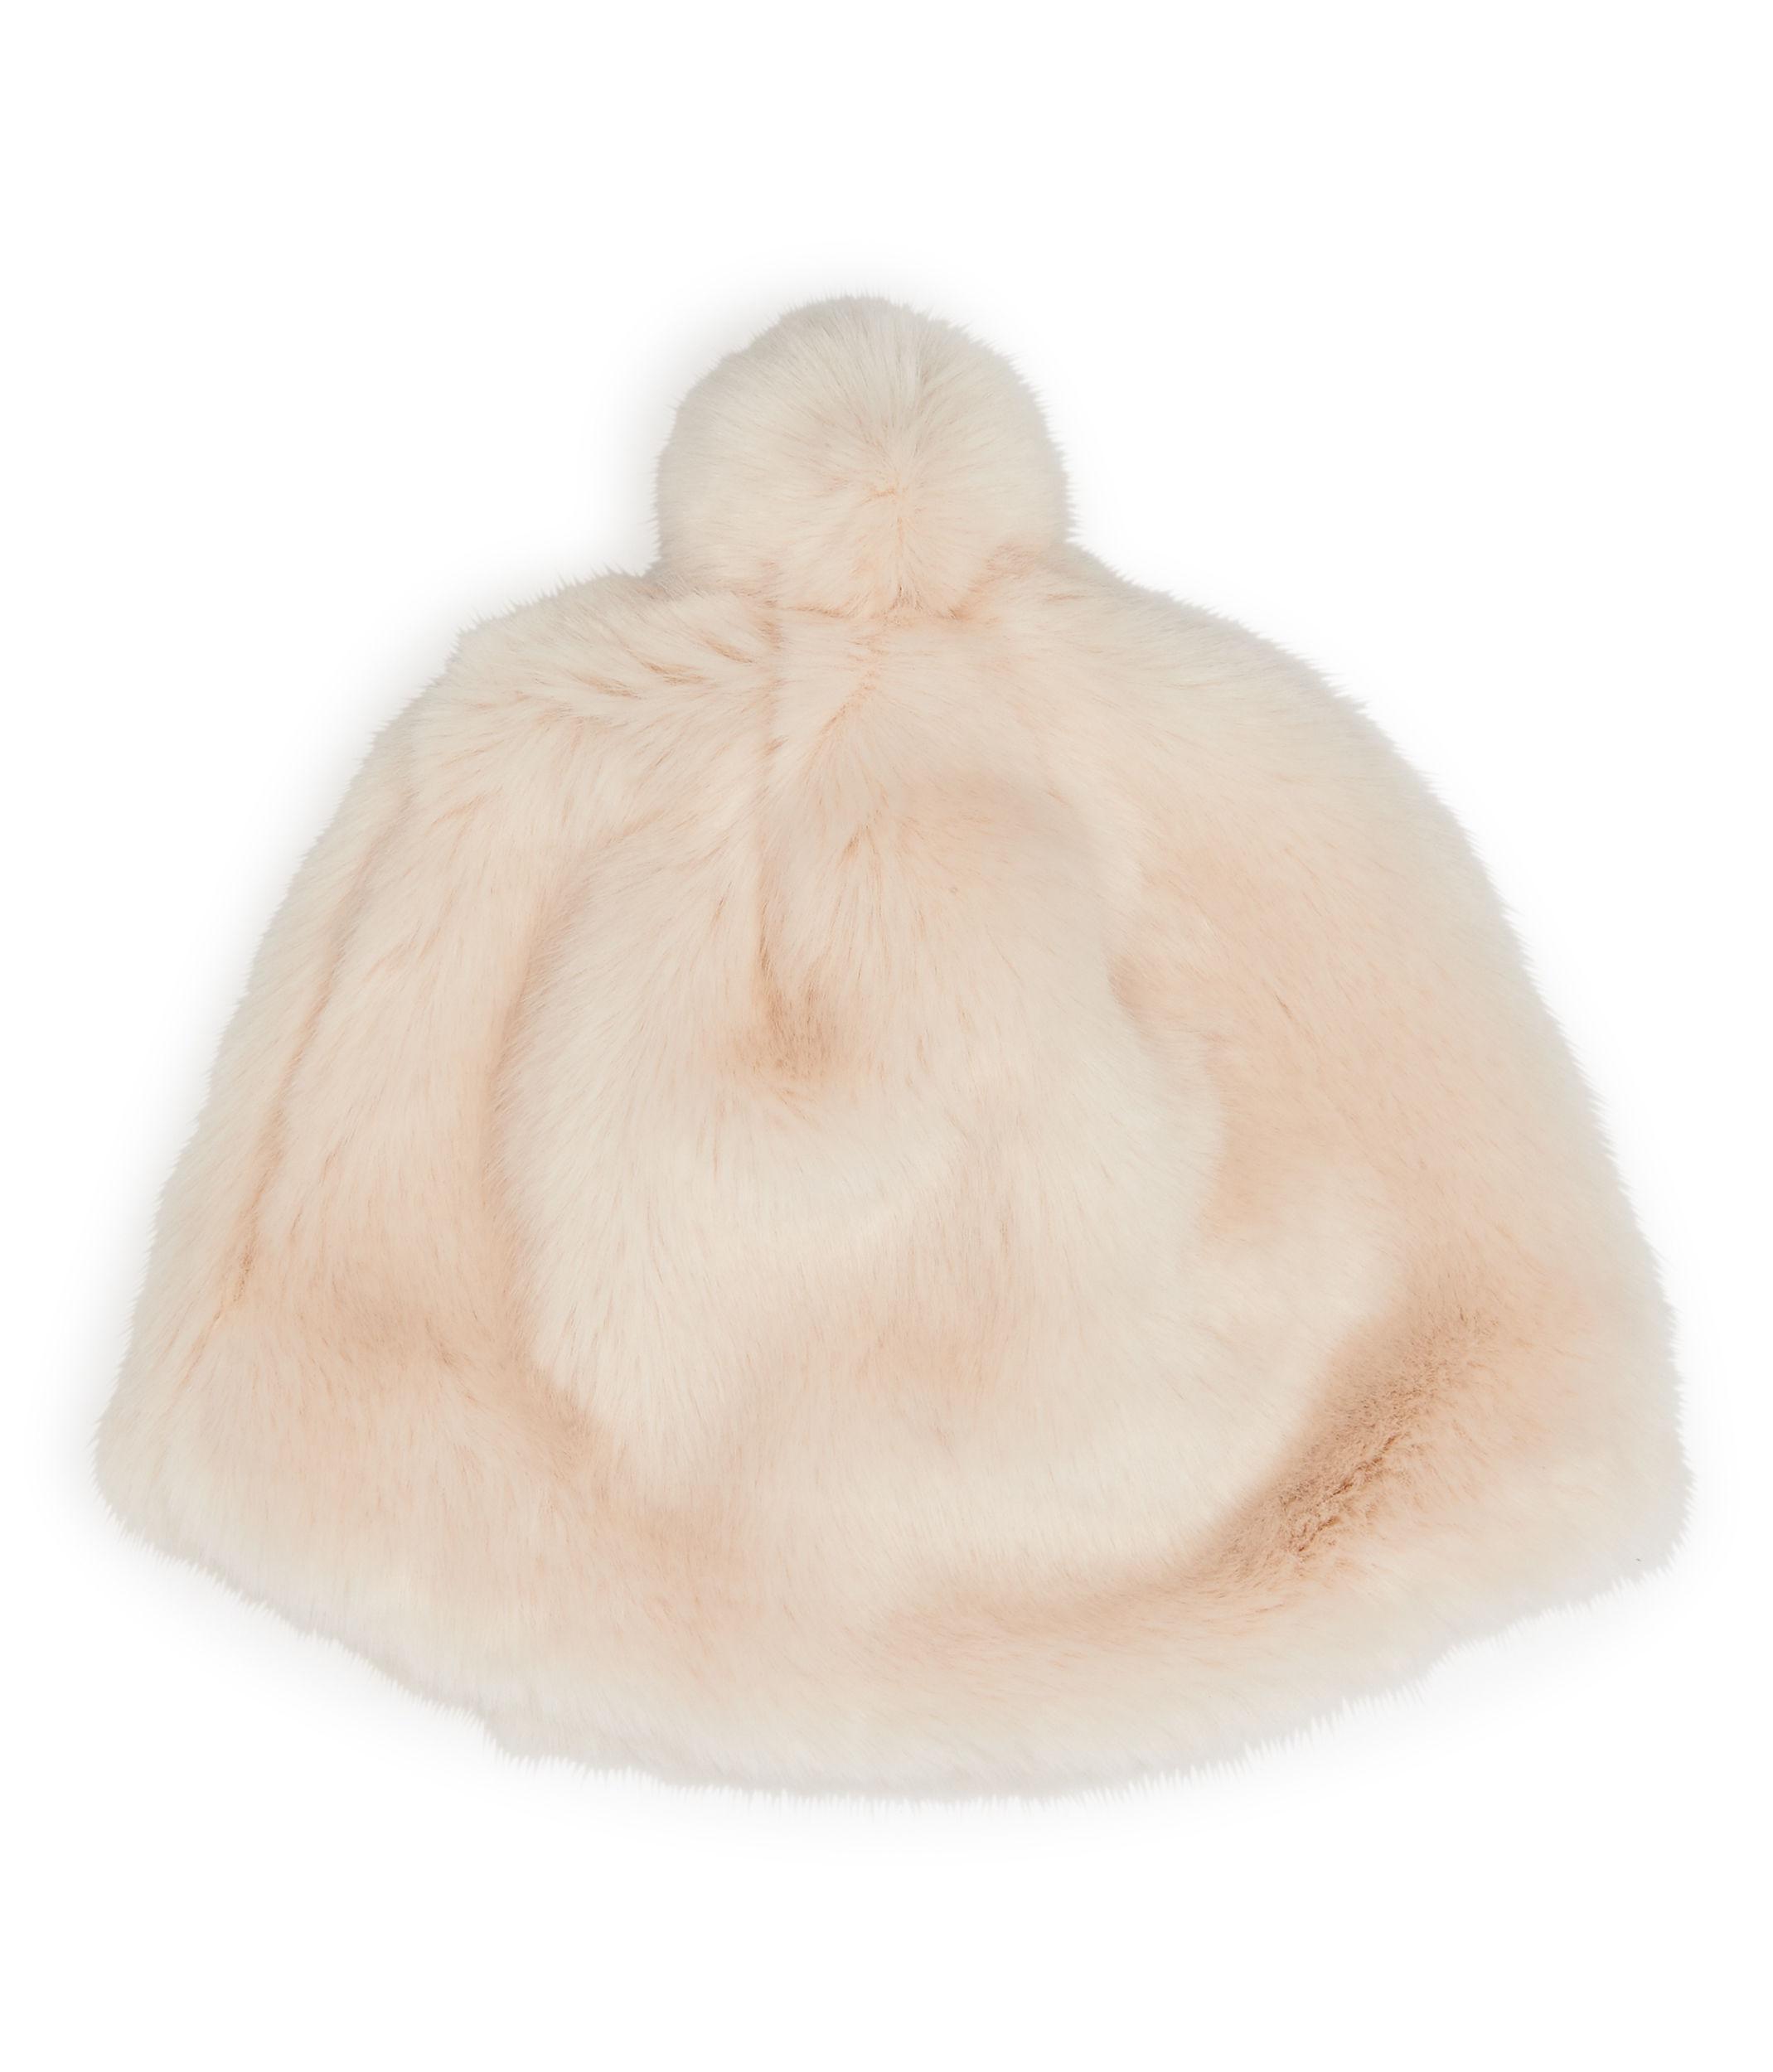 4773313a4f9 Lyst - Henri Bendel Blake Faux Fur Beanie in Pink